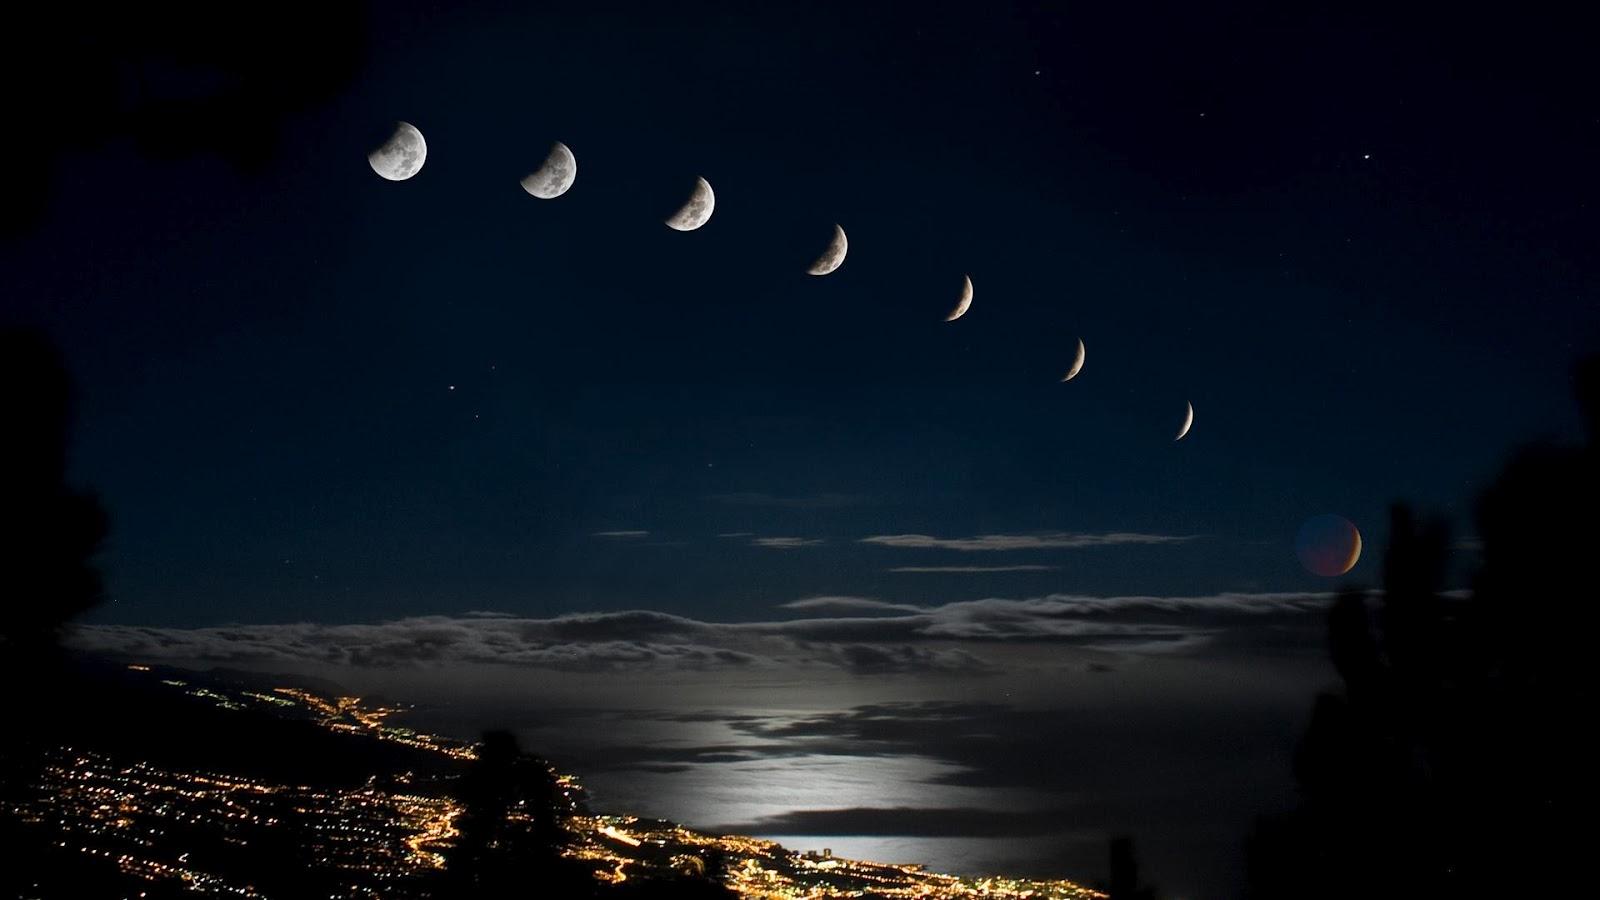 дата рождения по лунному календарю: